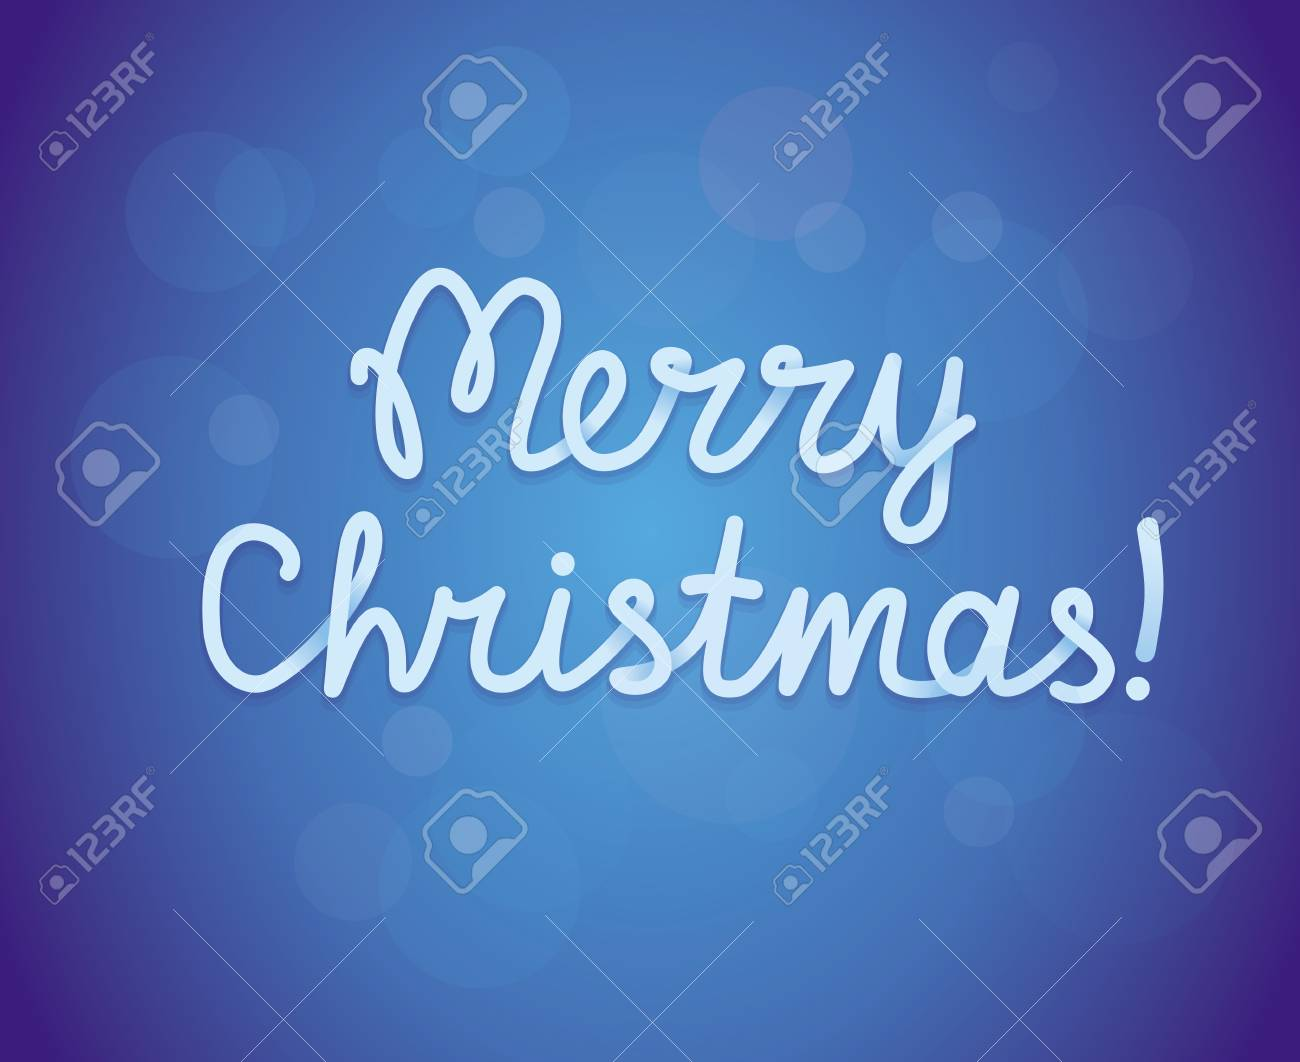 Merry christmas greeting card Stock Vector - 15755071